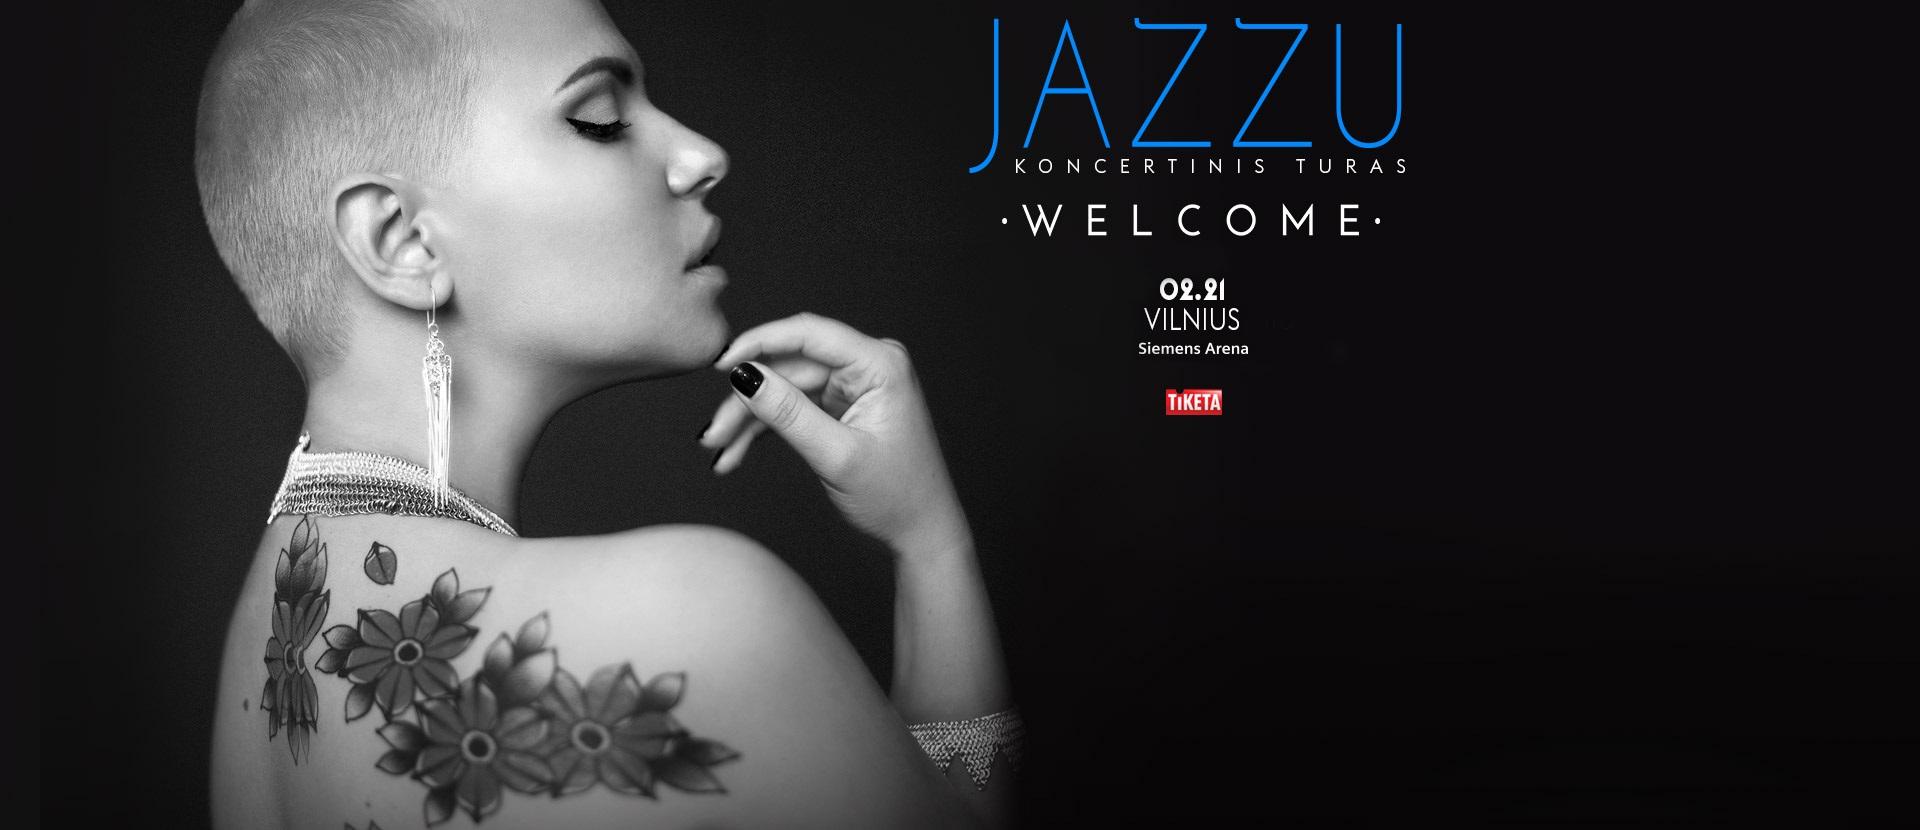 JAZZU. WELCOME koncertinis turas